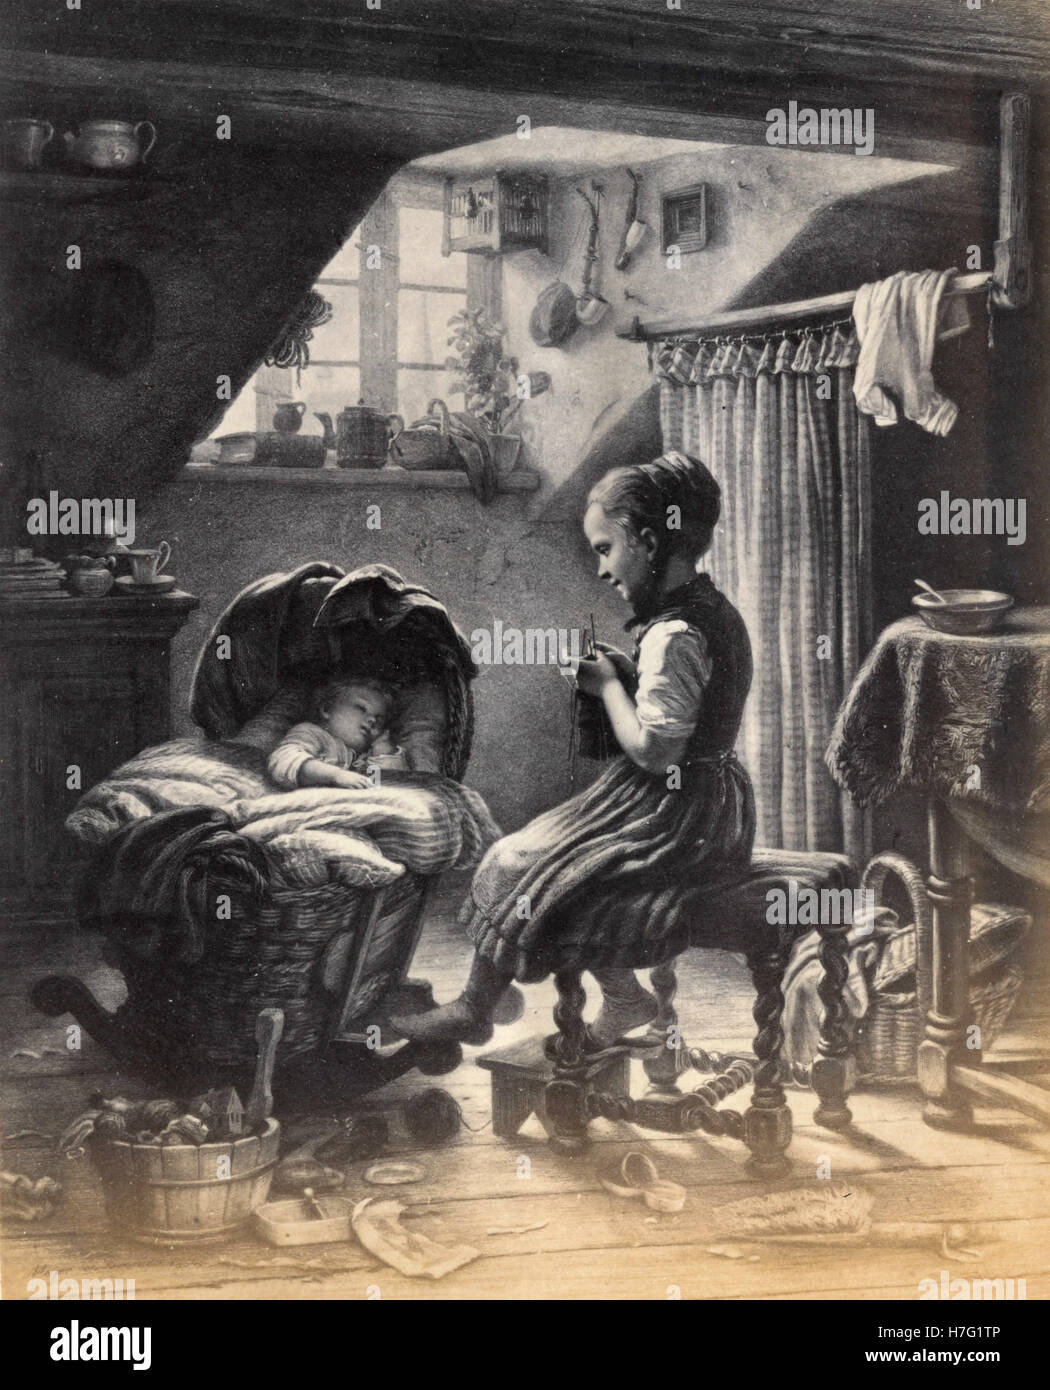 Tending the little ones, print after Johann Georg Meyer von Bremen - Stock Image